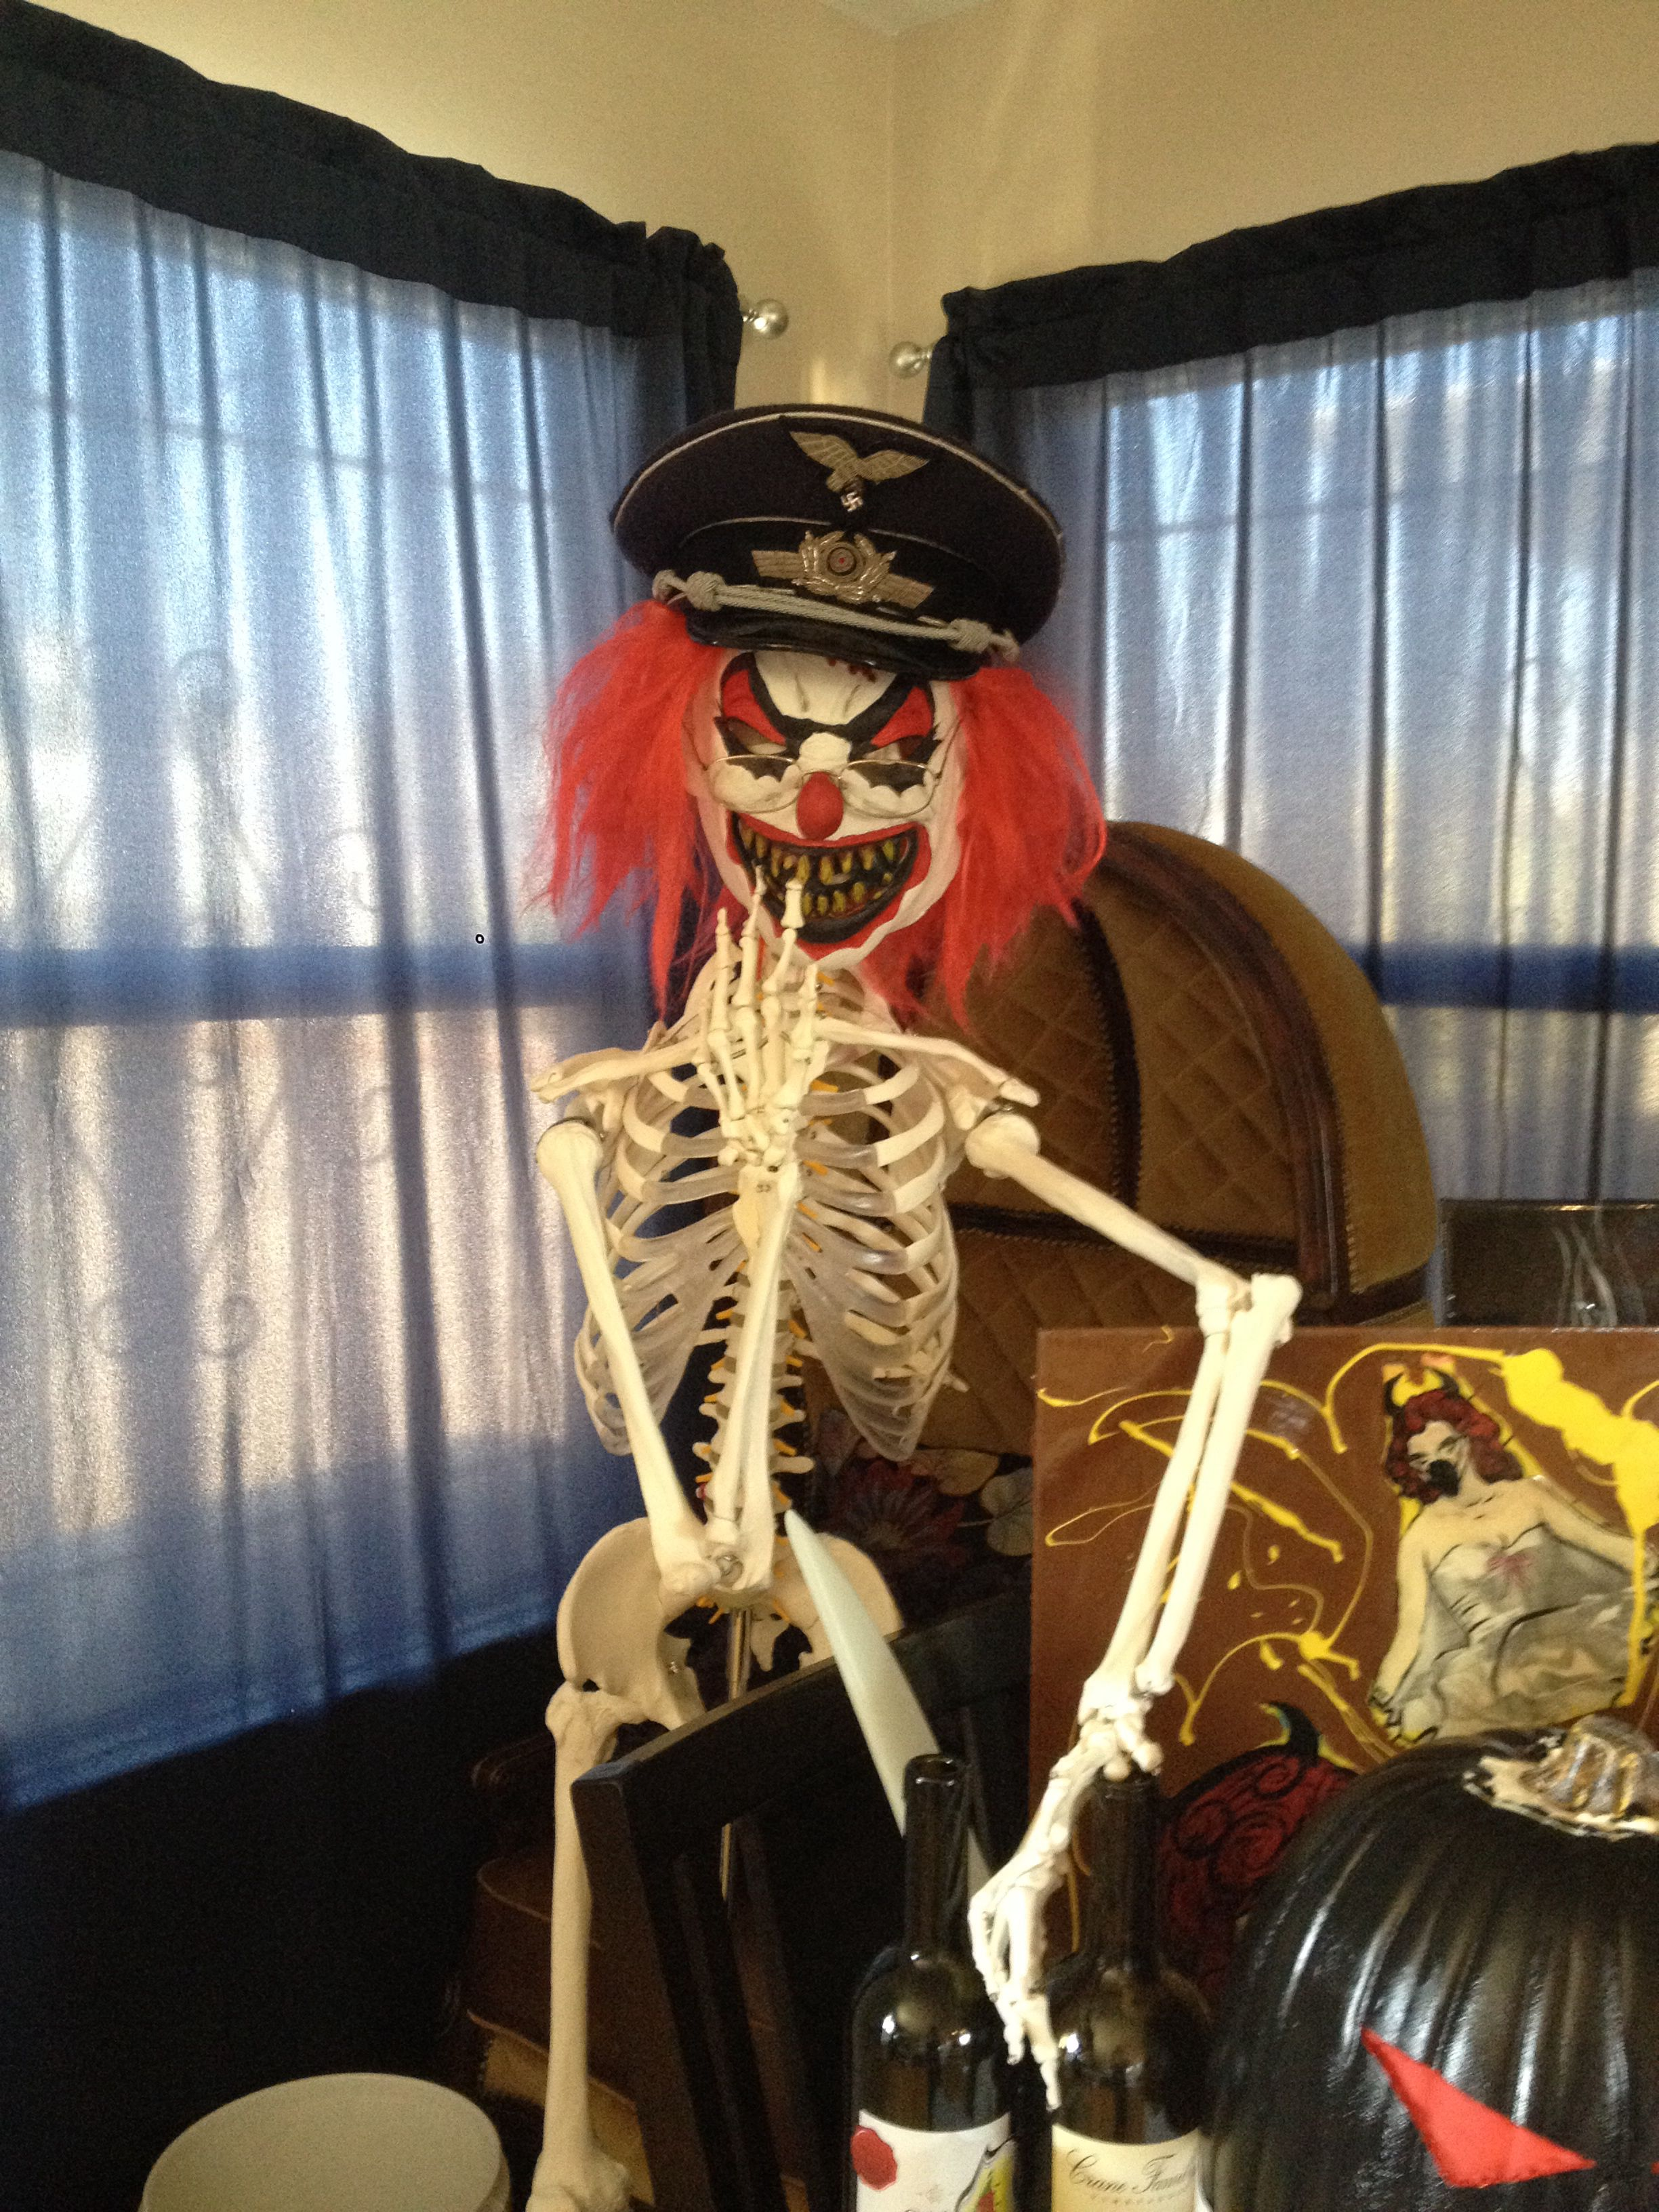 Scary clown skeleton Halloween prop decoration